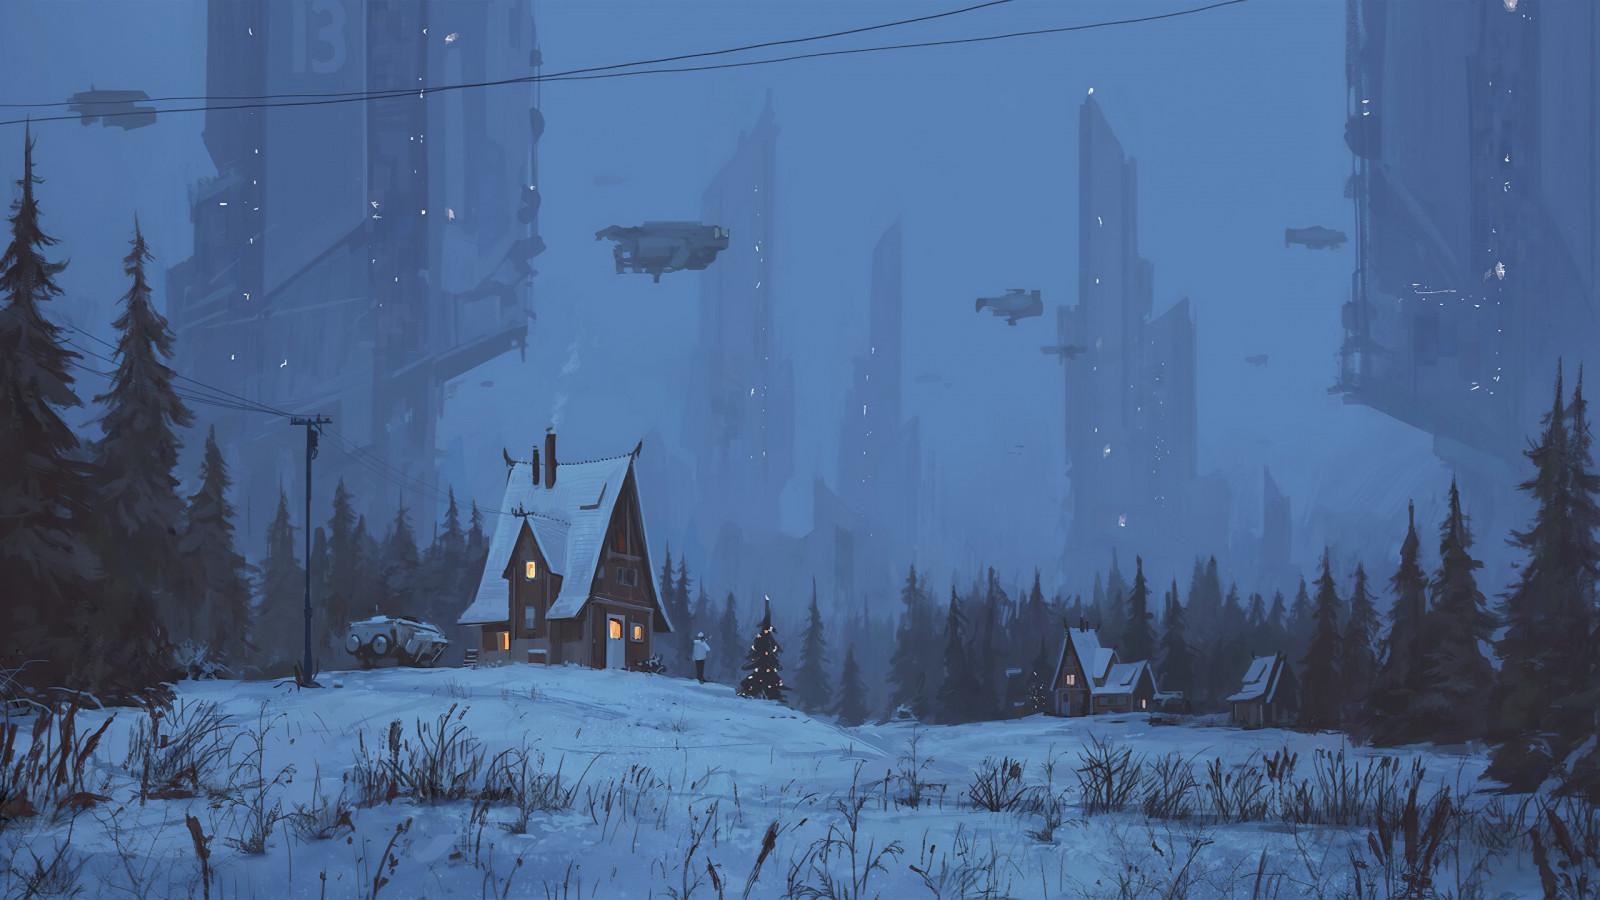 inverno, Natale, cyberpunk, fantascienza, erba, la neve, Space Shuttle, linee elettriche, arte digitale, opera d'arte, digitale